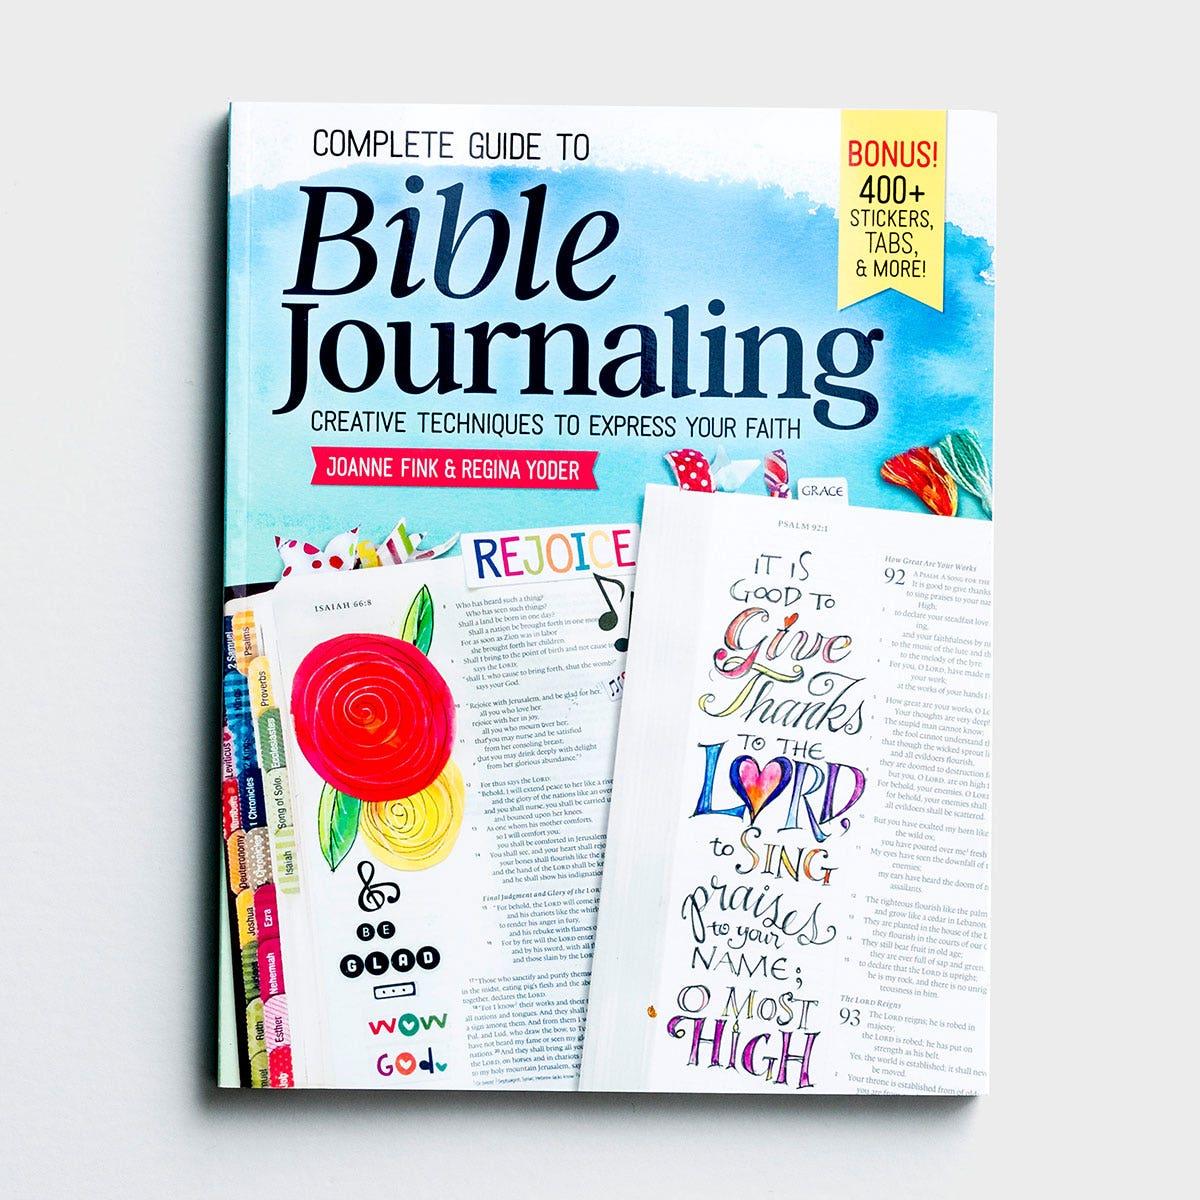 Joanne Fink, Regina Yoder - Complete Guide to Bible Journaling